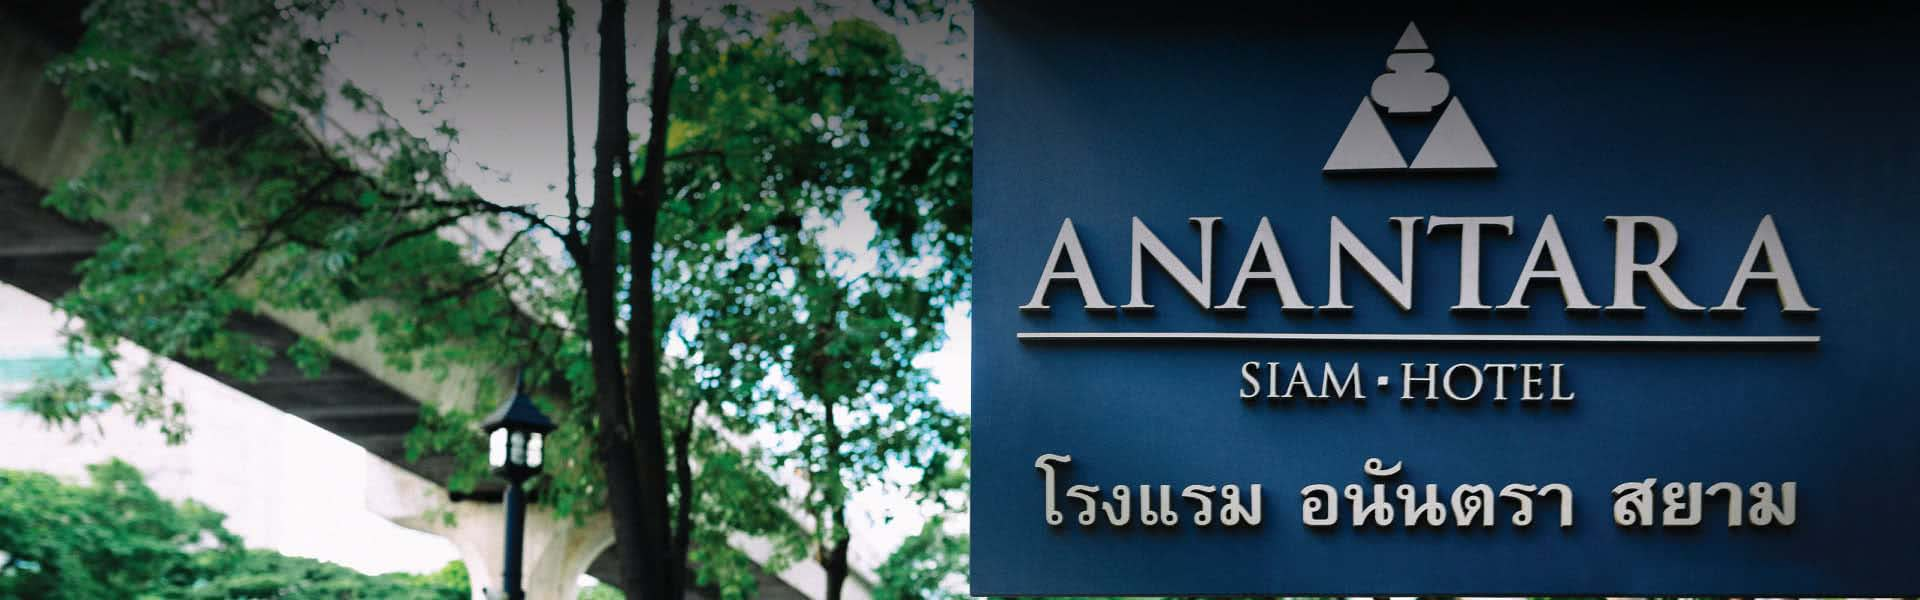 Luxury City Hotel in Bangkok   Contact Anantara Siam